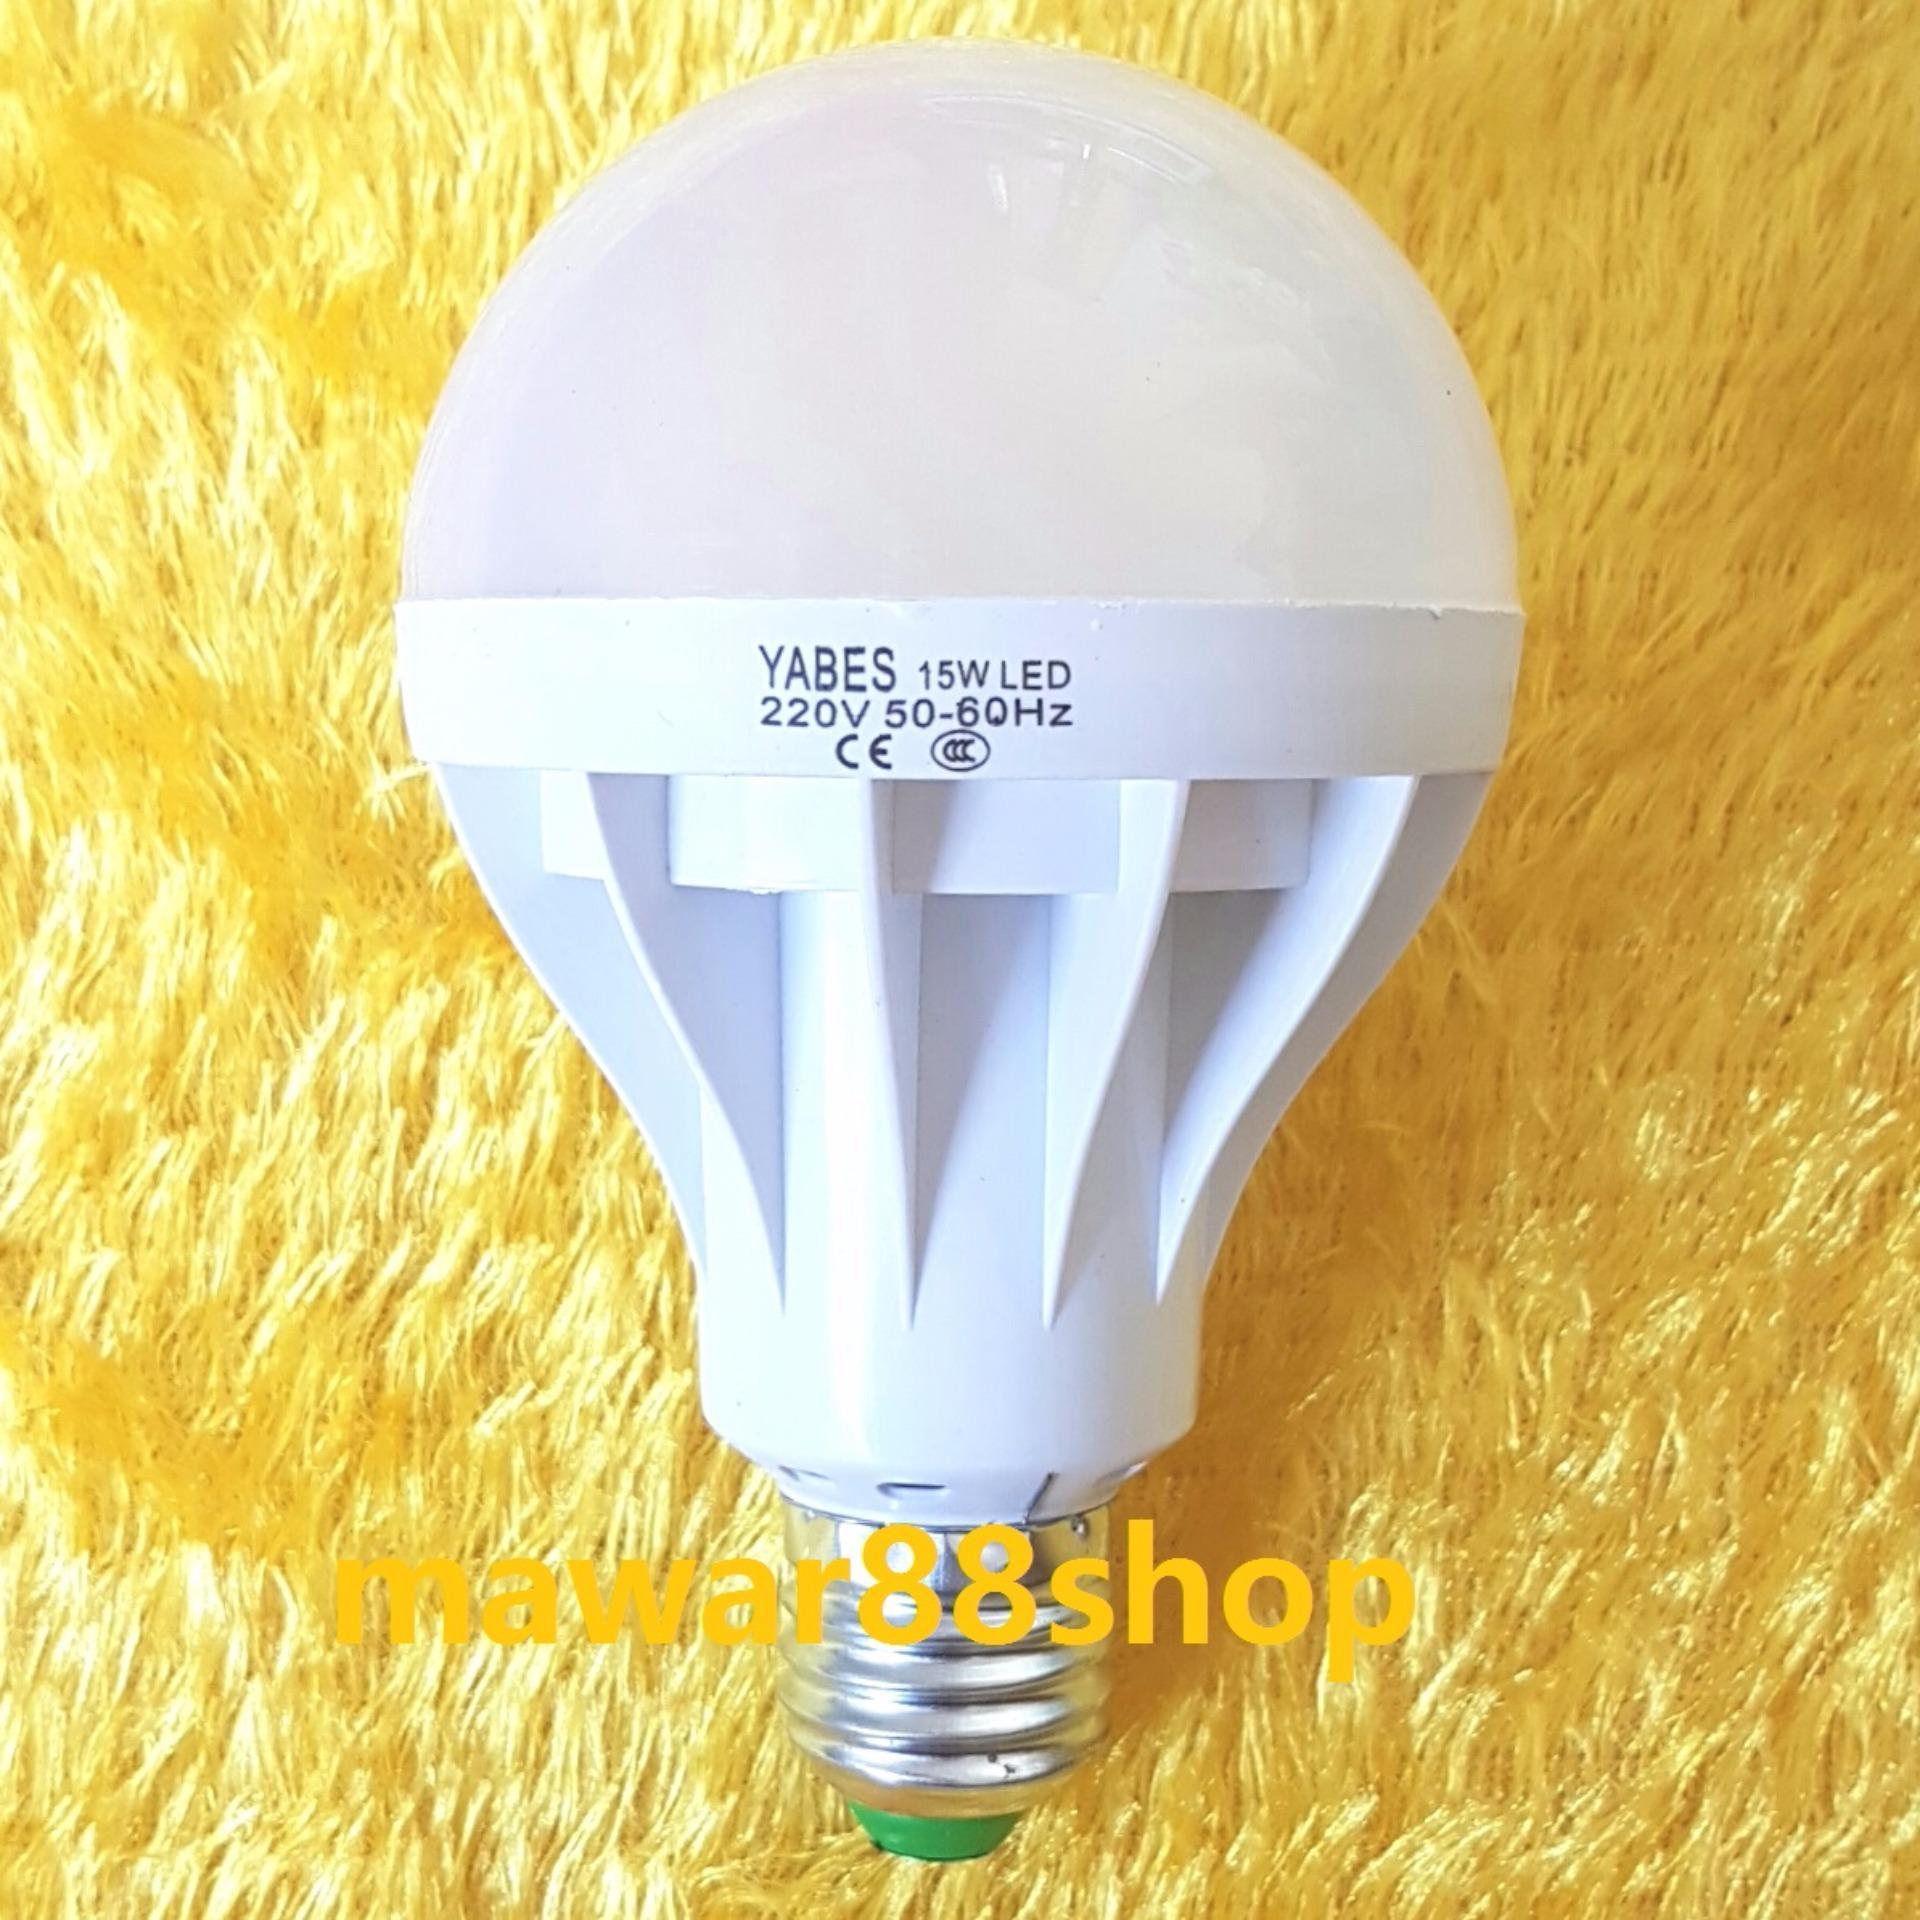 Lvling Bola Lampu Mitsuyama 15 Watt Review Harga Terkini Dan Led Bulb Bohlam Aliteco Daylight Yabes Setara 75 Biasa